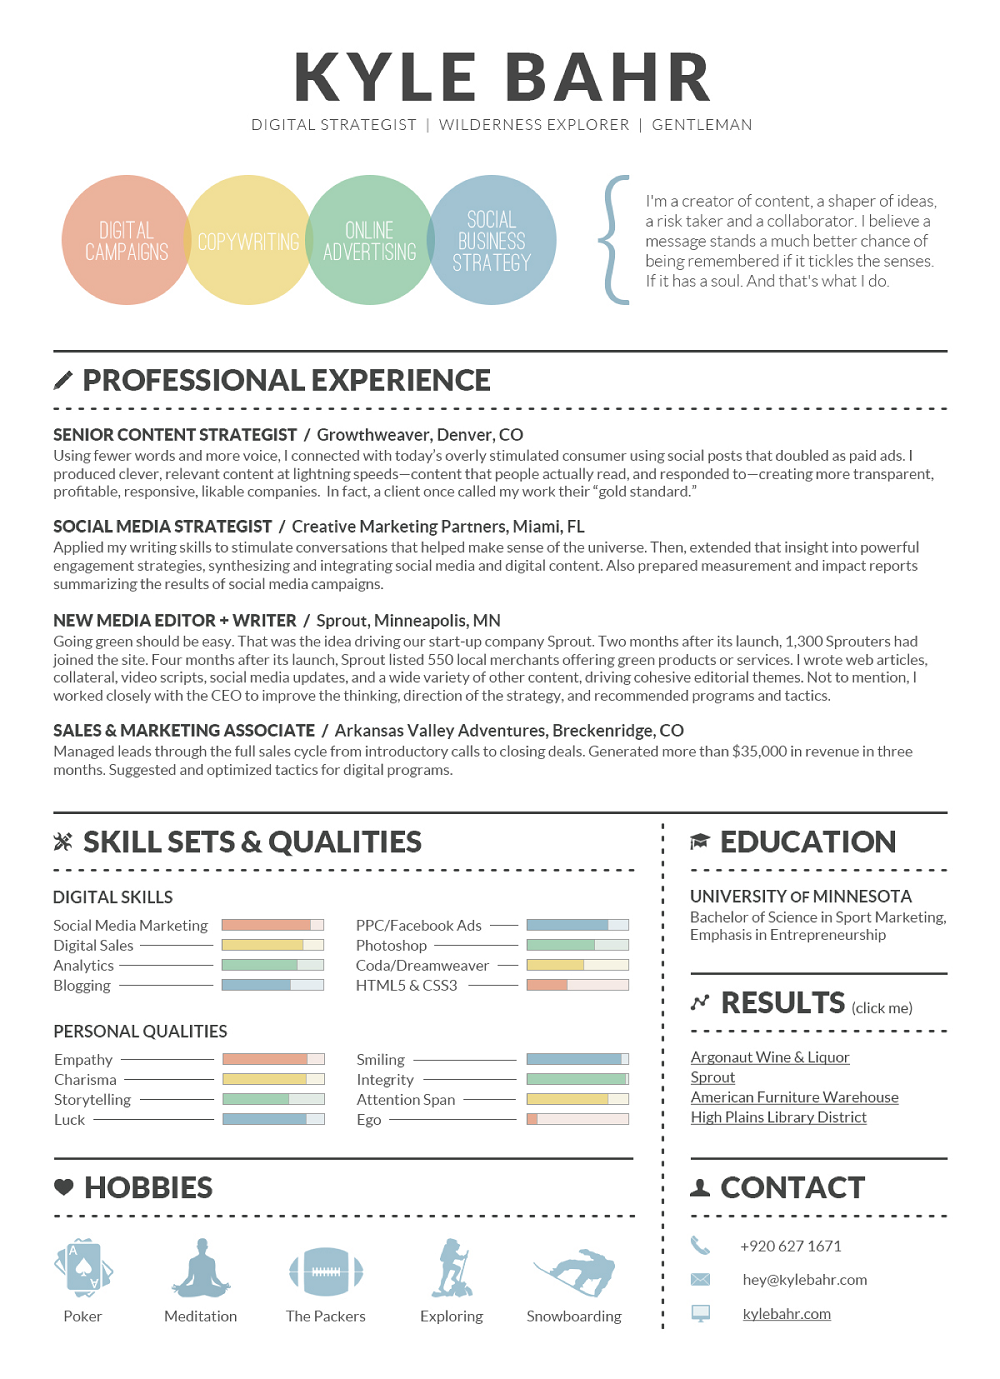 Digital Strategist Infographic Resume Kyle Bahr Visualresume Infographicresume Infographic Resume Visual Resume Digital Marketing Strategist